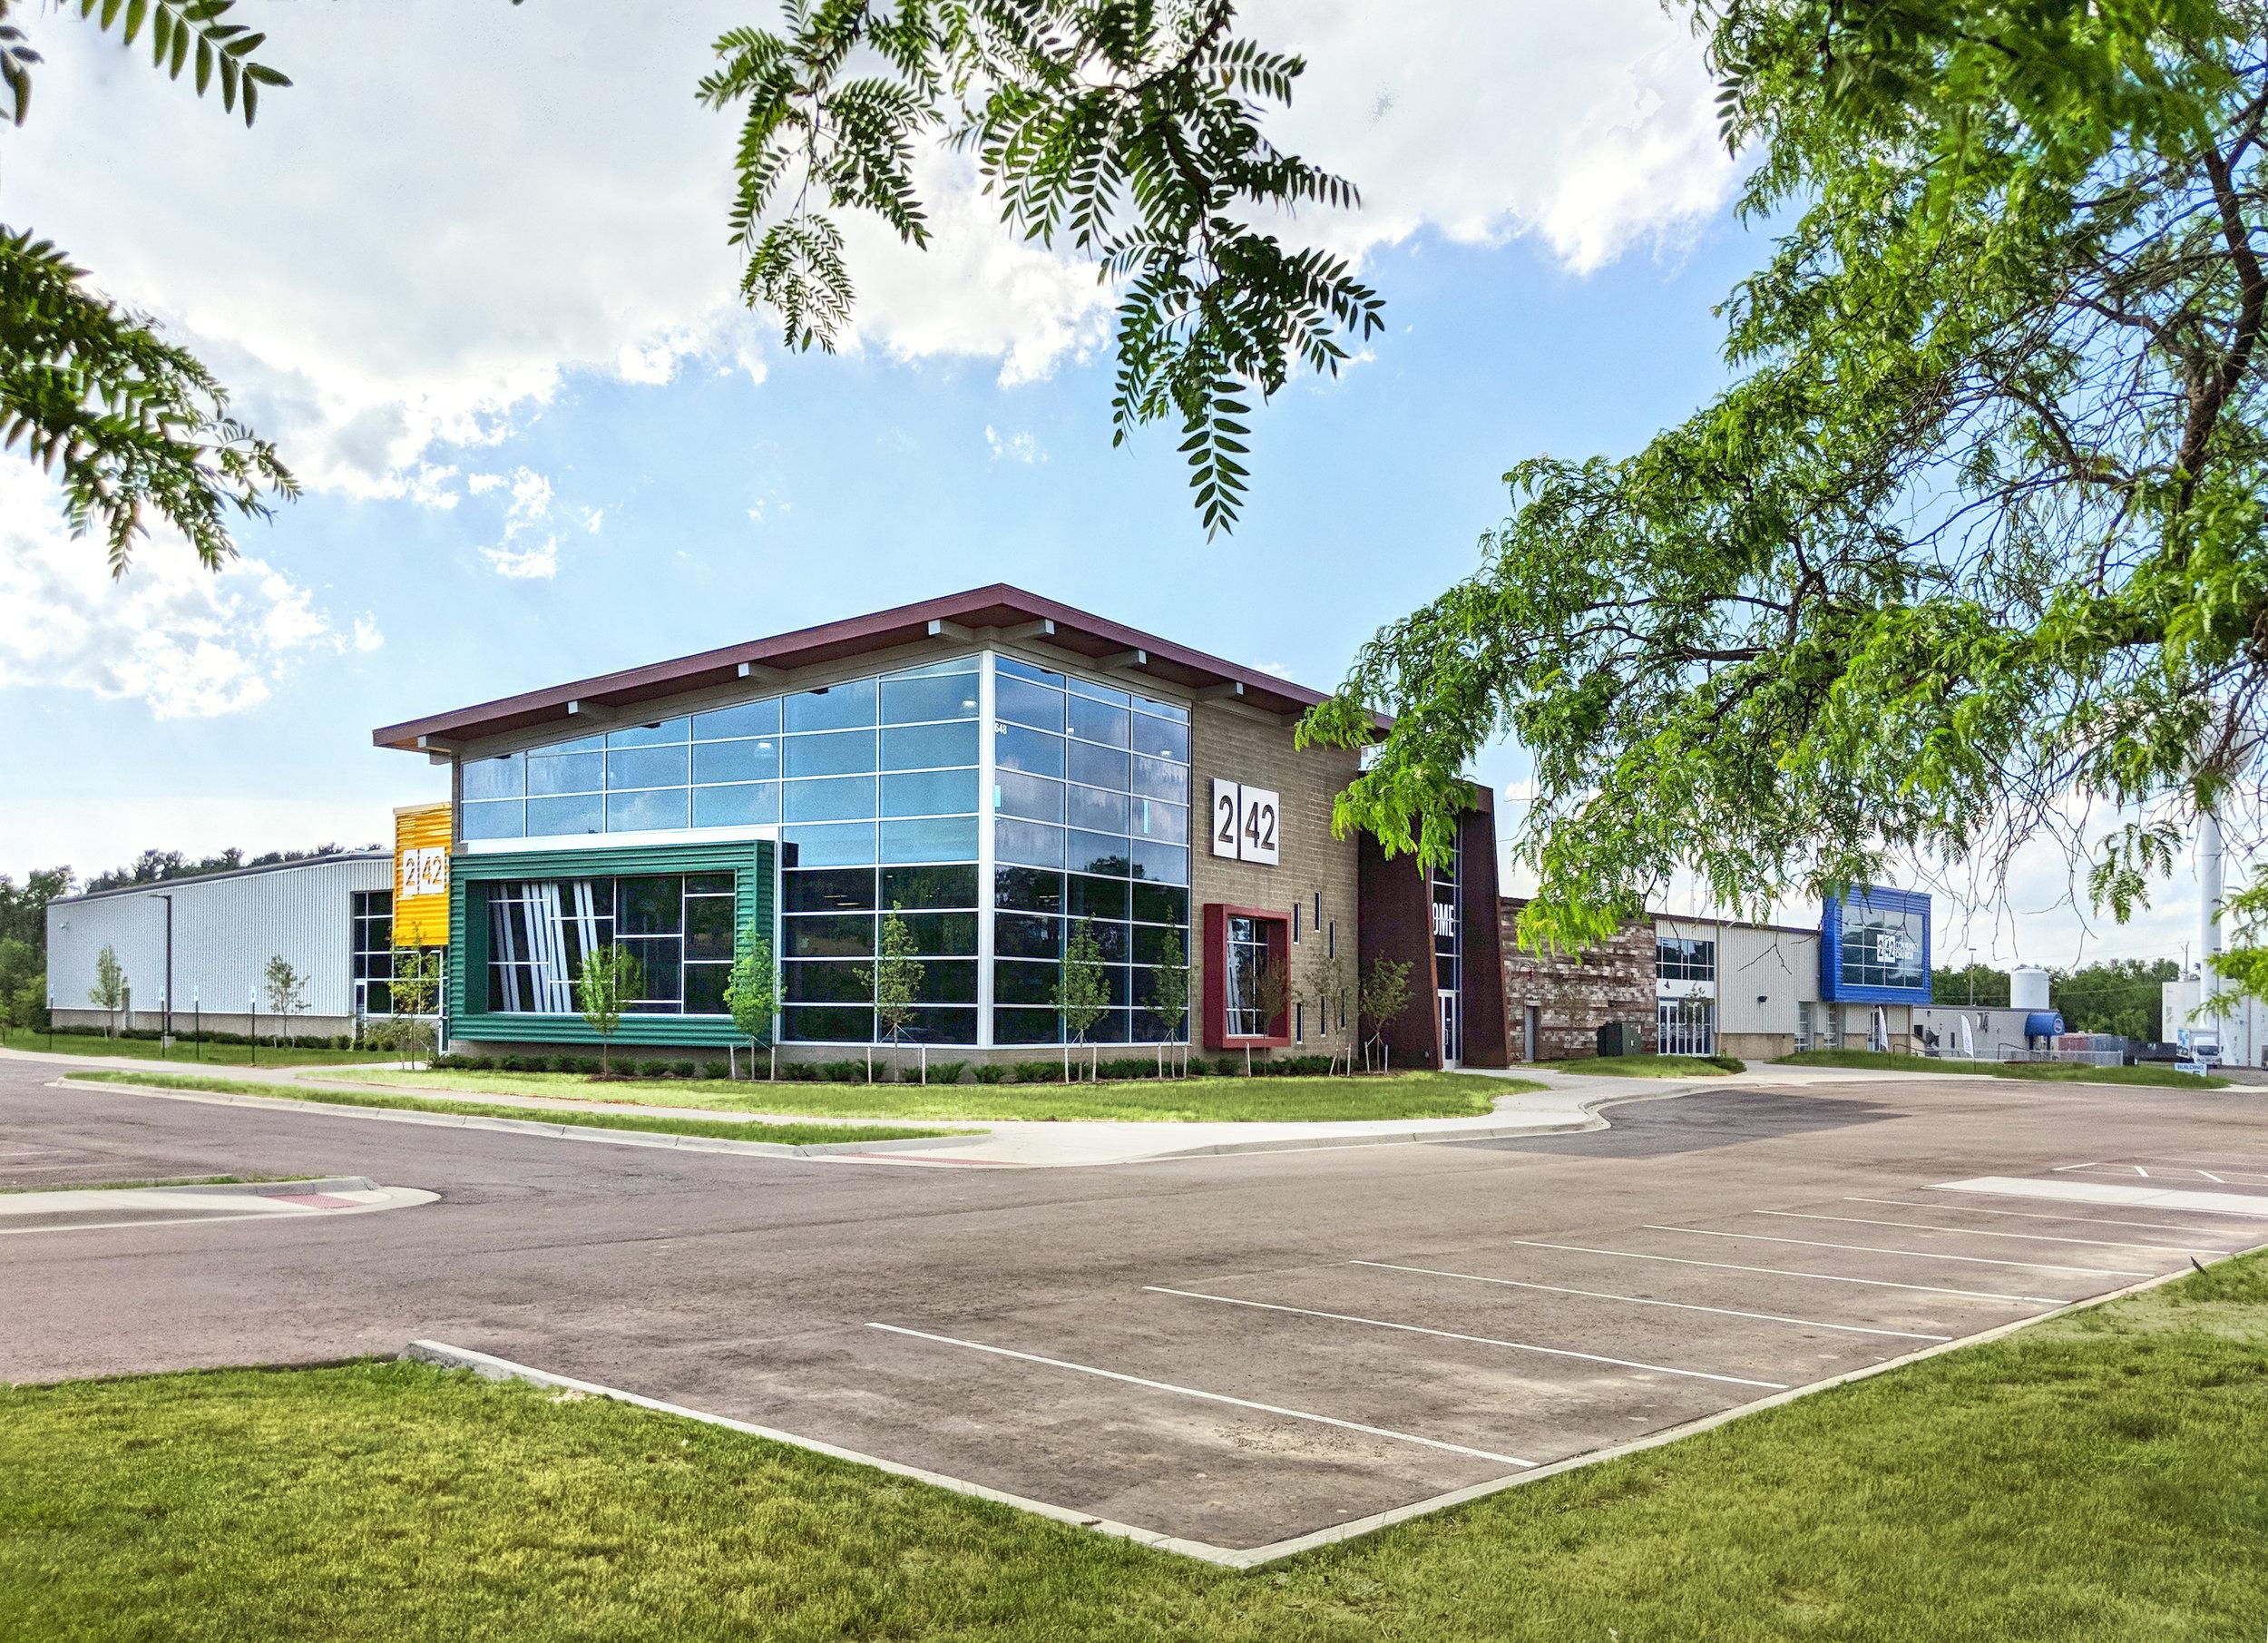 WORSHIP   2|42 Community Church - Ann Arbor   View Studio Projects